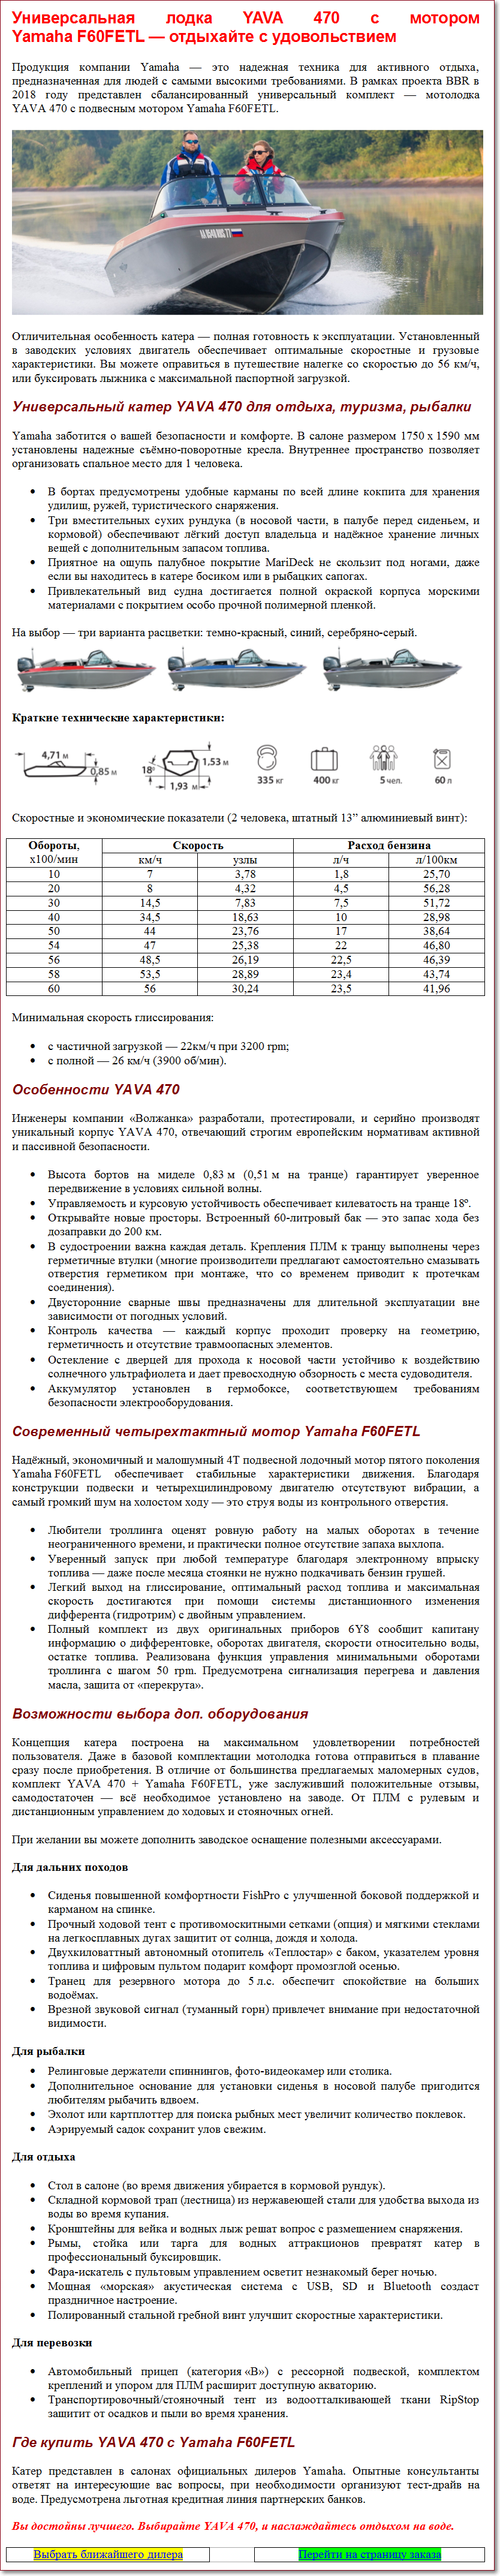 Описание моторной лодки Yava 470 и Yamaha F60